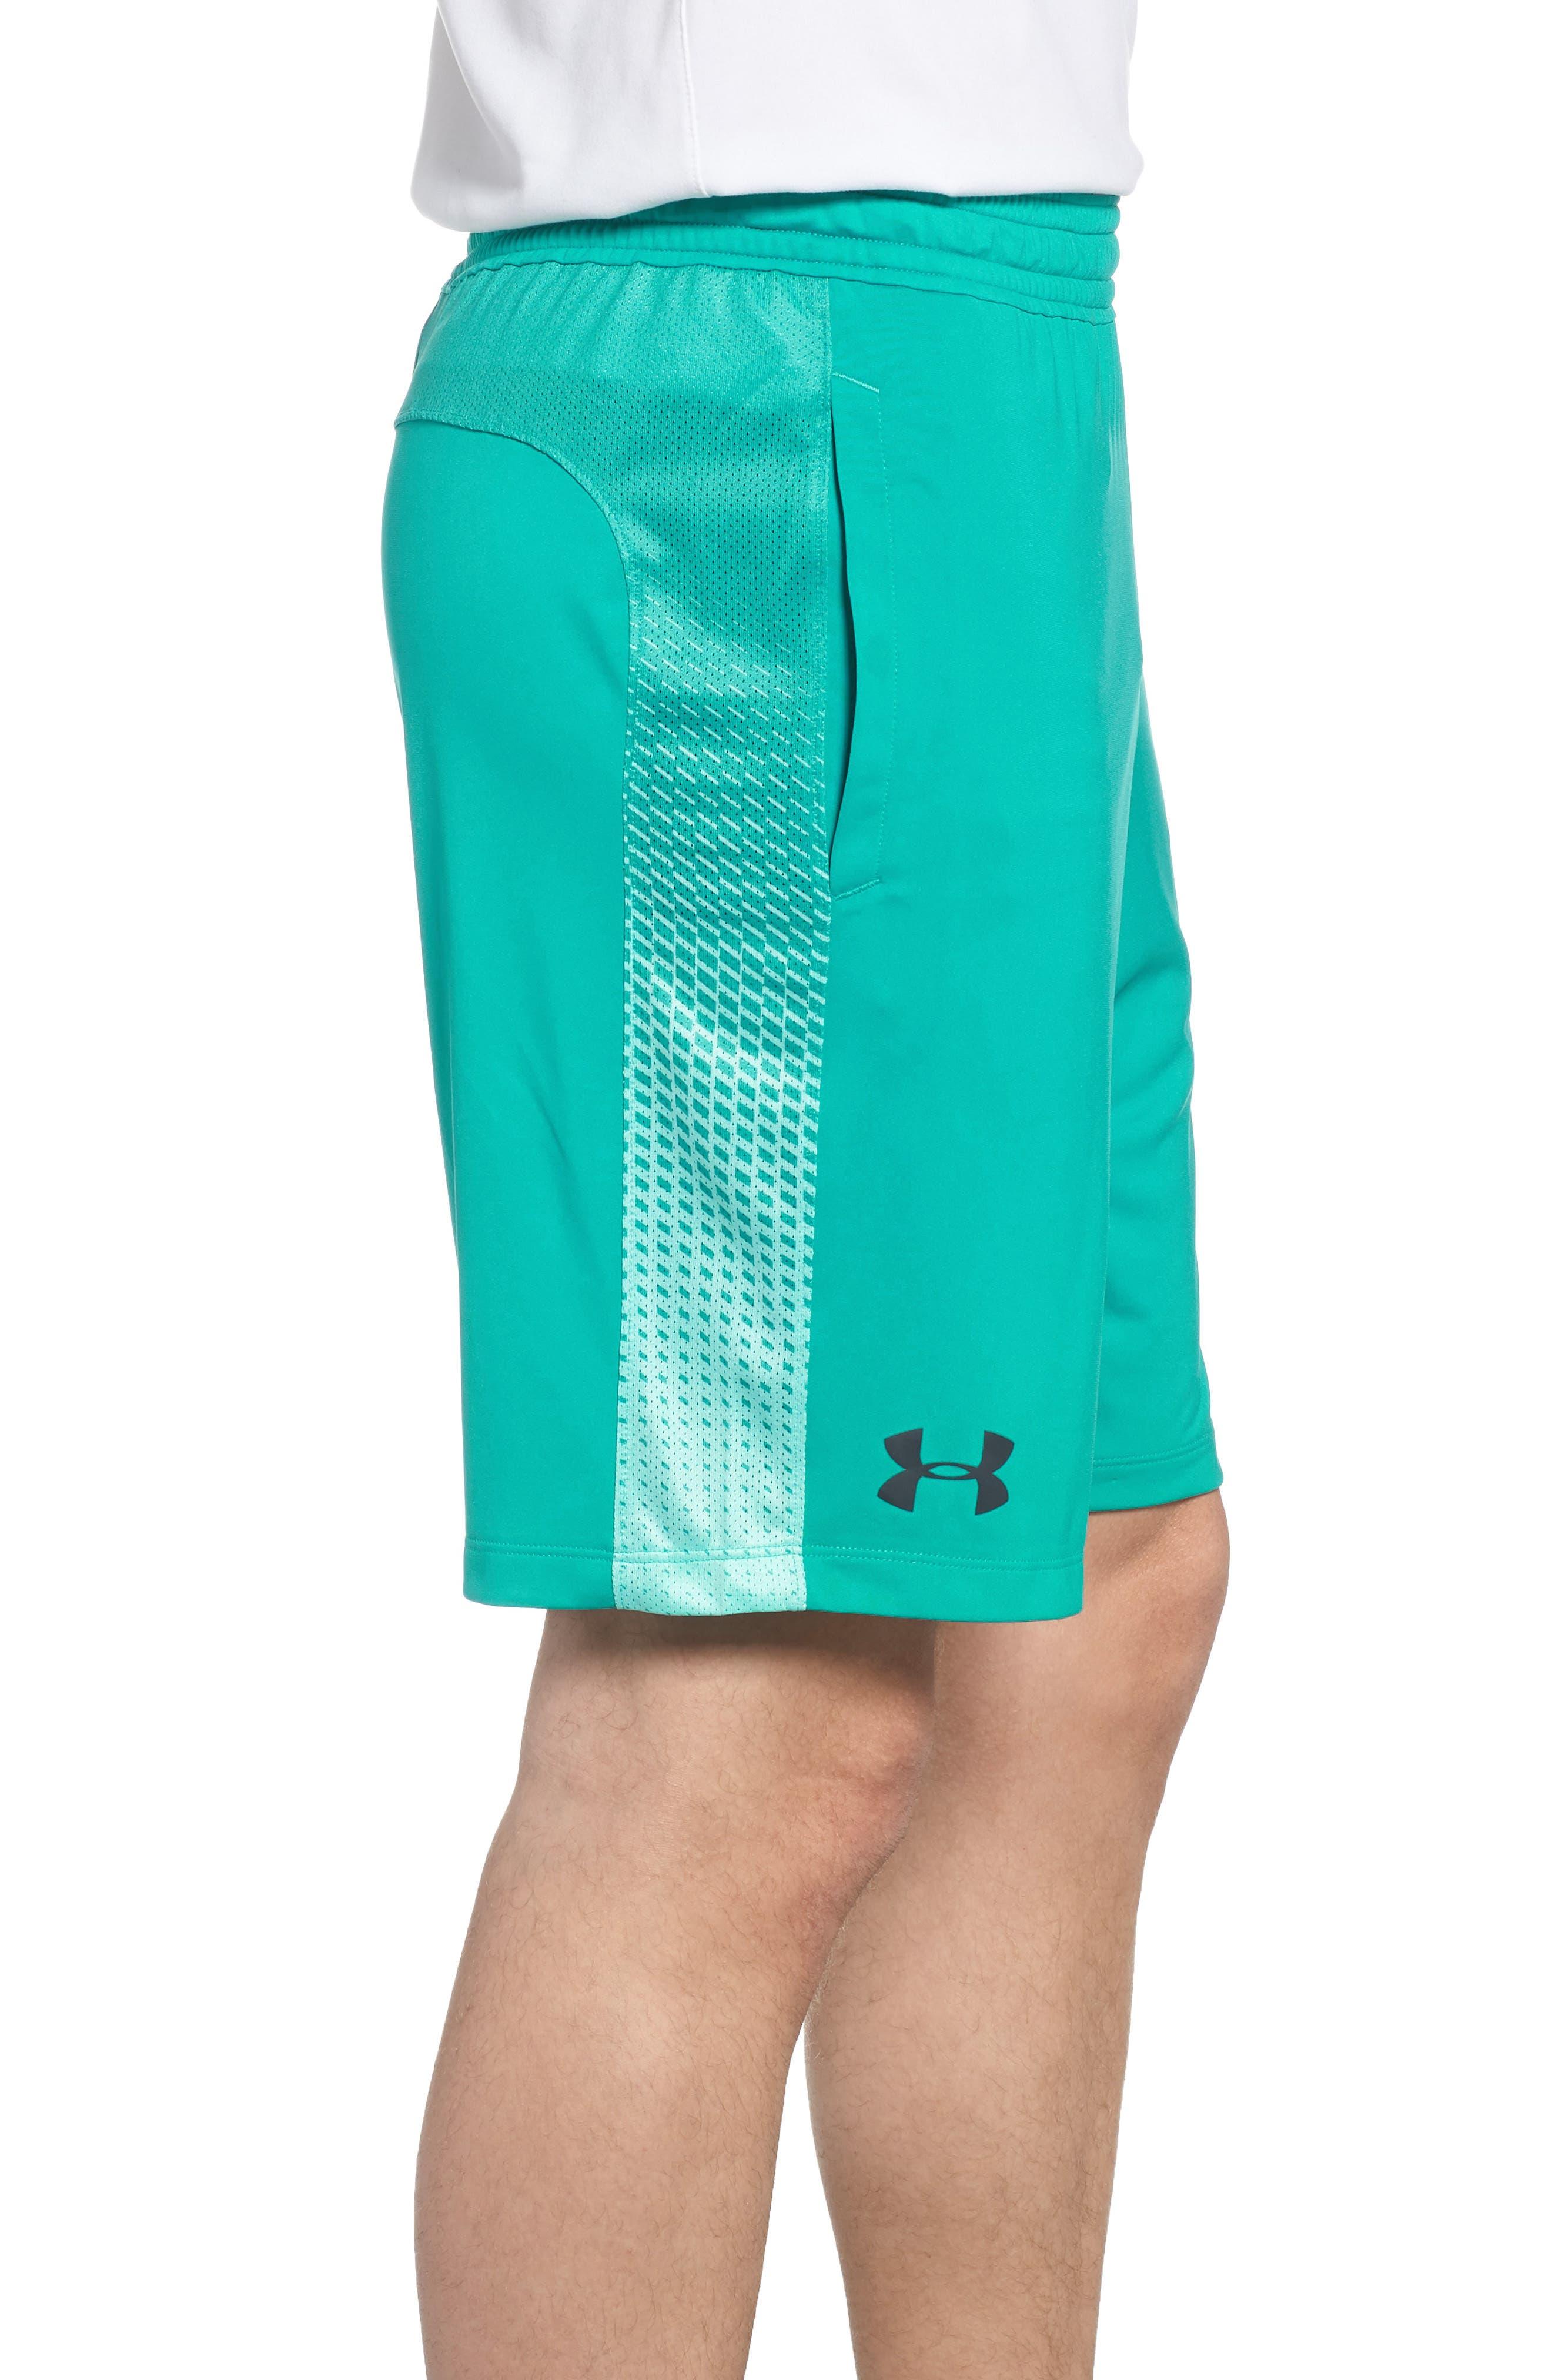 Mk1 Inset Fade Shorts,                             Alternate thumbnail 3, color,                             SWALLOWTAIL / TIDE / GREY